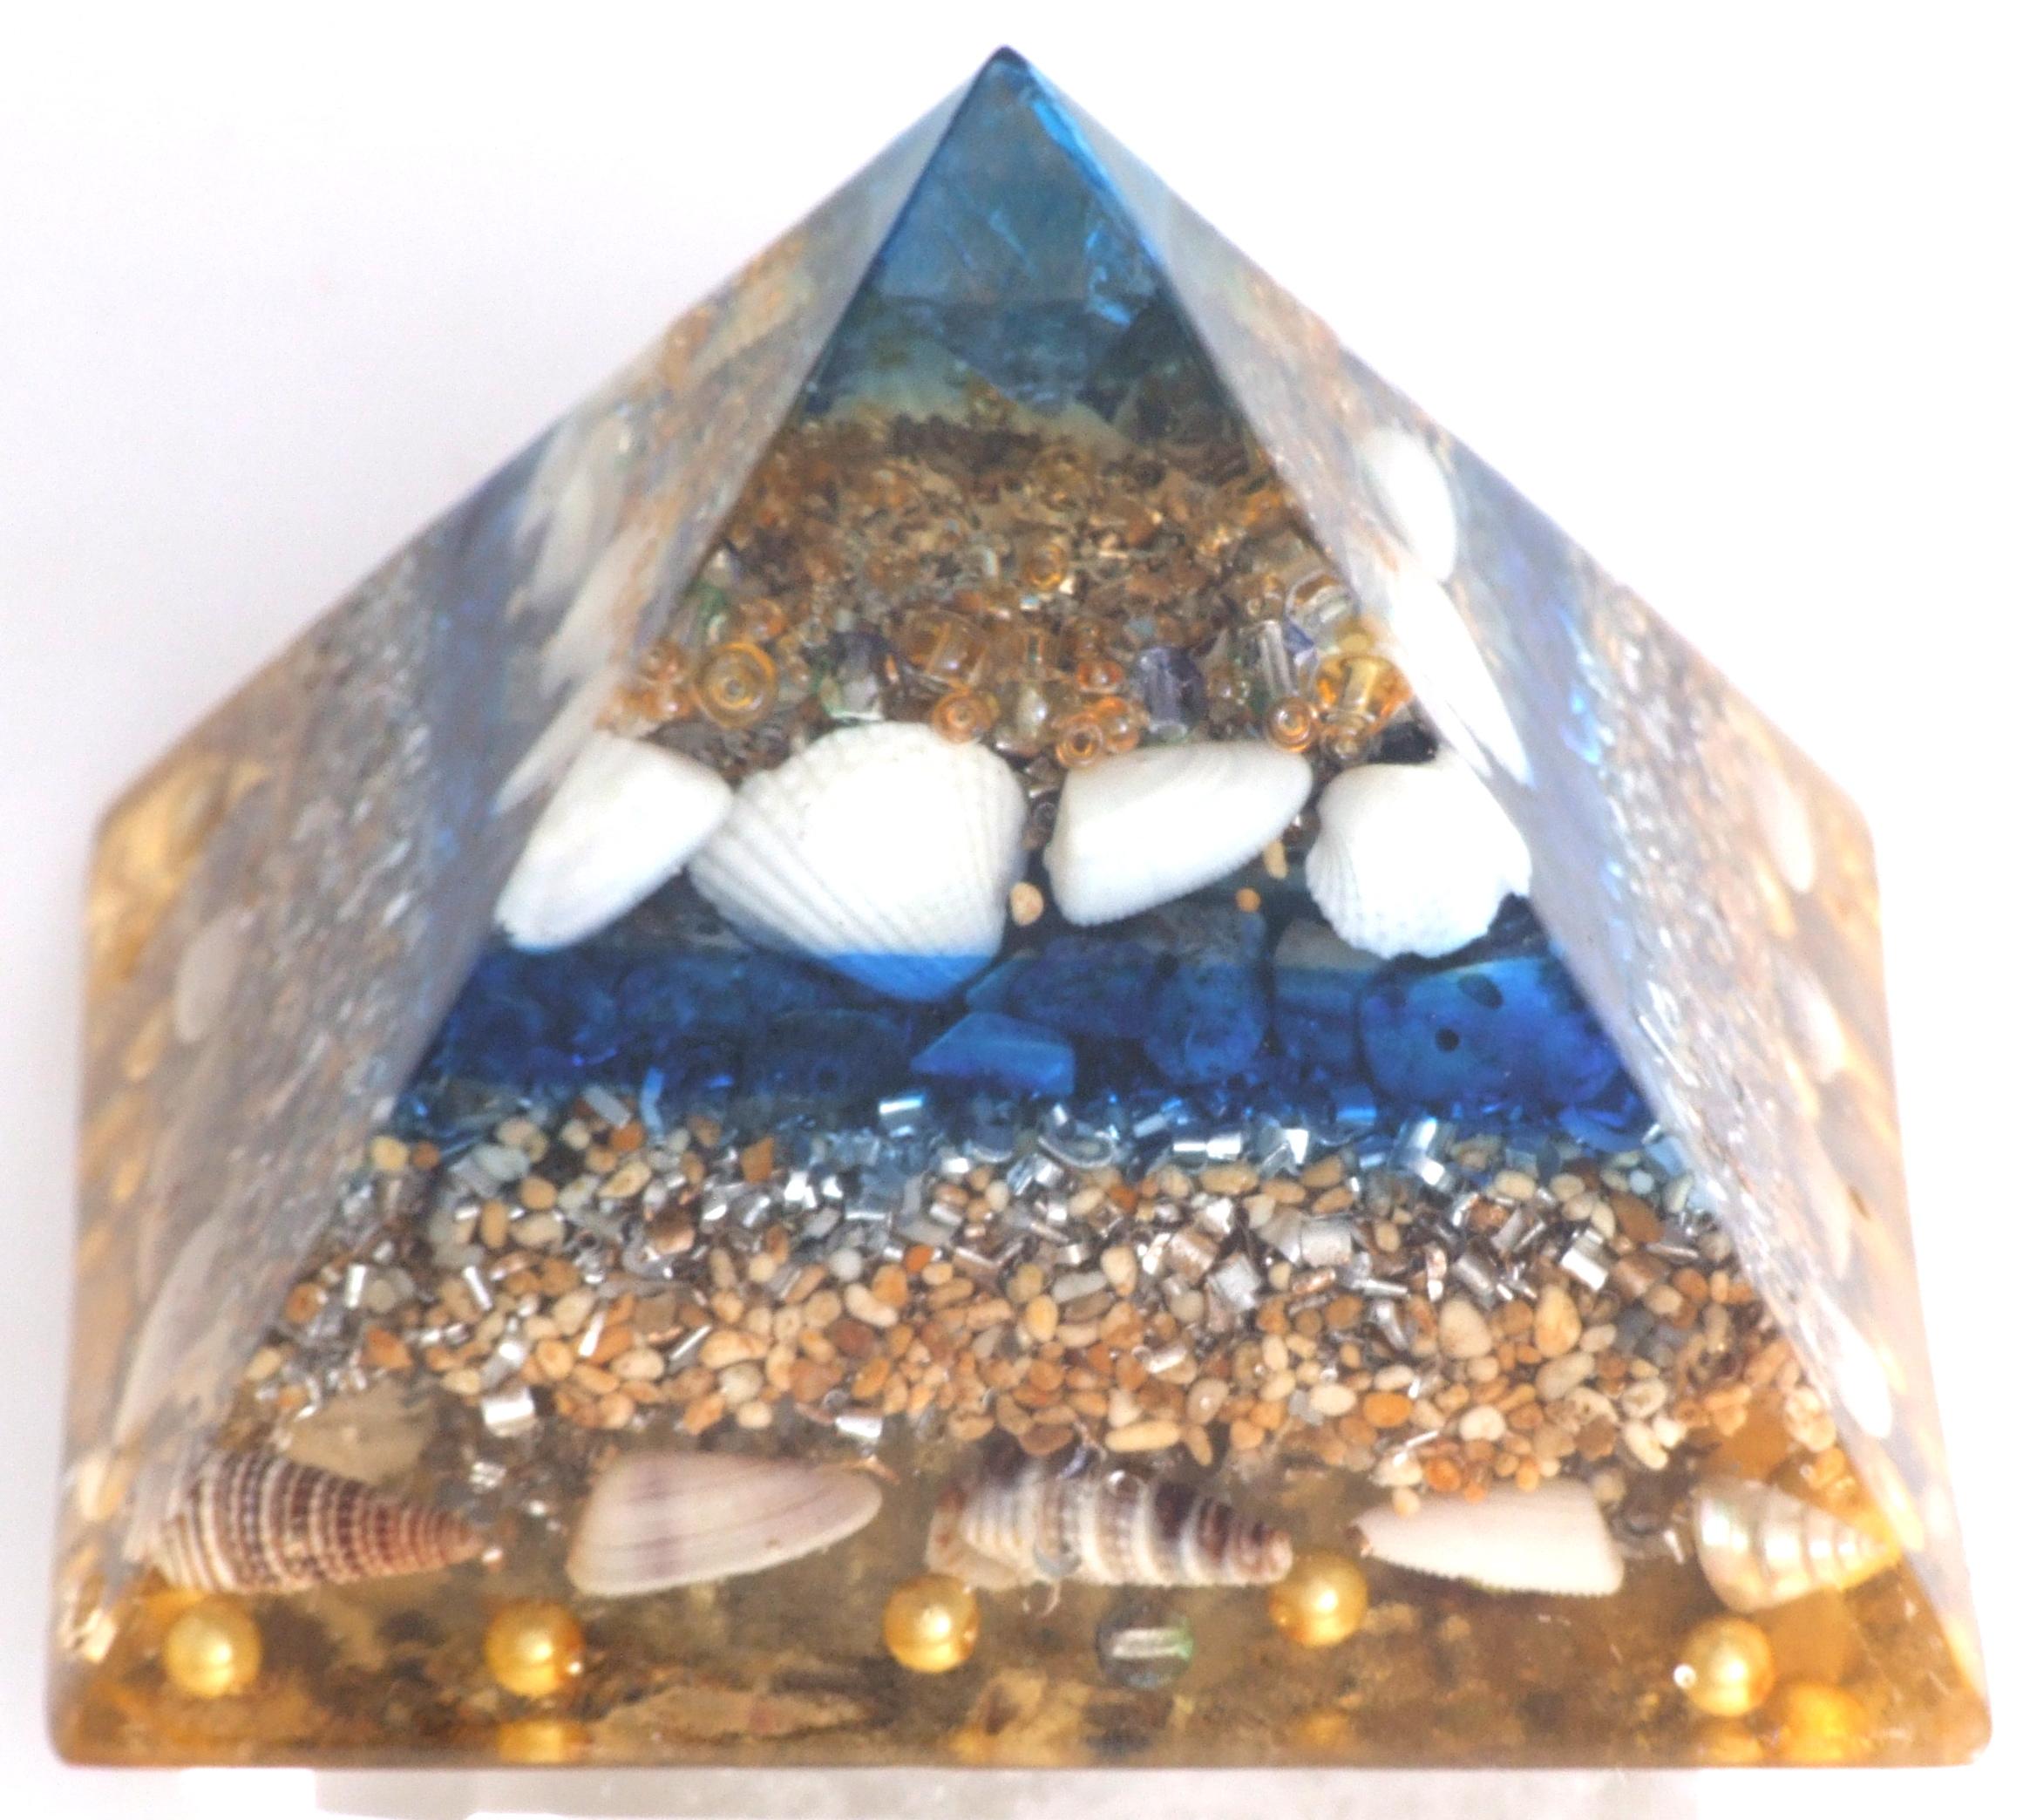 Divine Kauai Powerful Beautiful Orgone Shell & Flourite Pyramid. Orgonite from the Sea. Magical Kauai Orgone. Cell phone and Mobile Devices, Meditation Orgone, Enhanced Power Hearts.